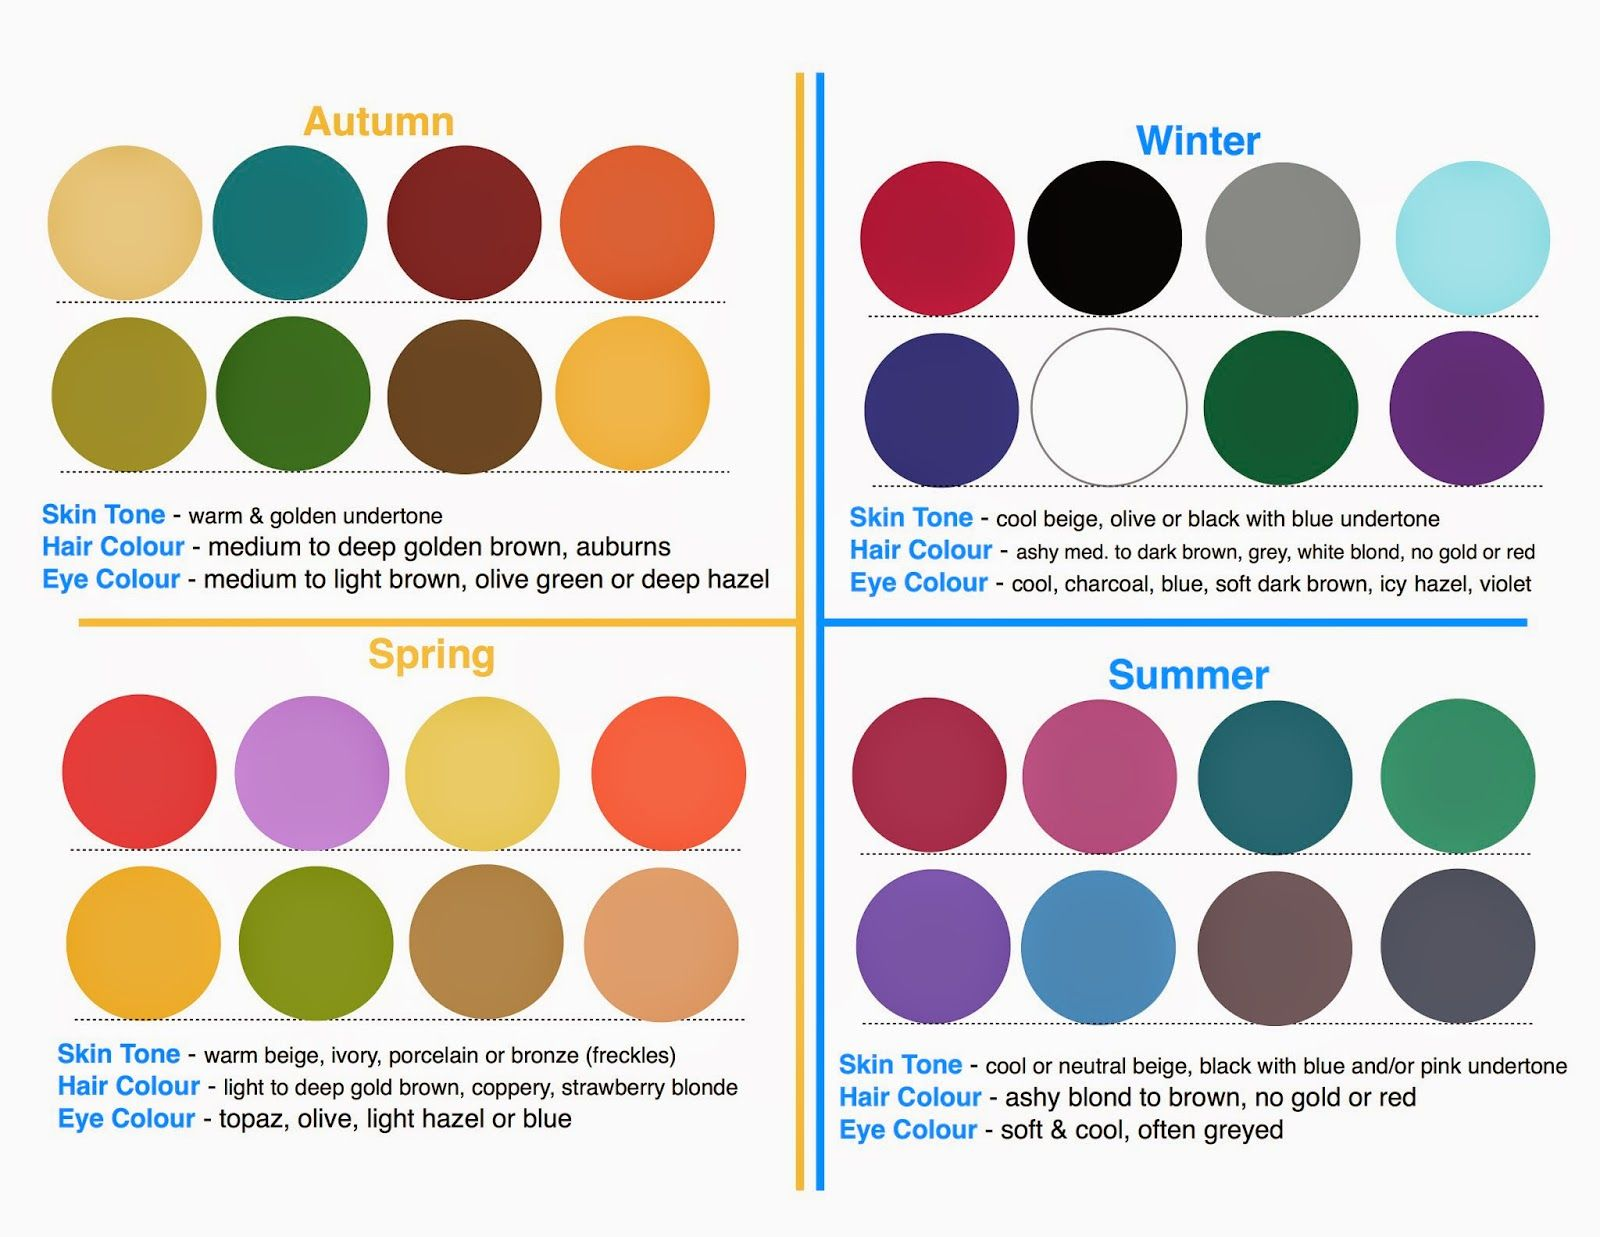 4seasoncoloursystemjpg 1 600 1 237 pixlar - Season Pictures To Colour